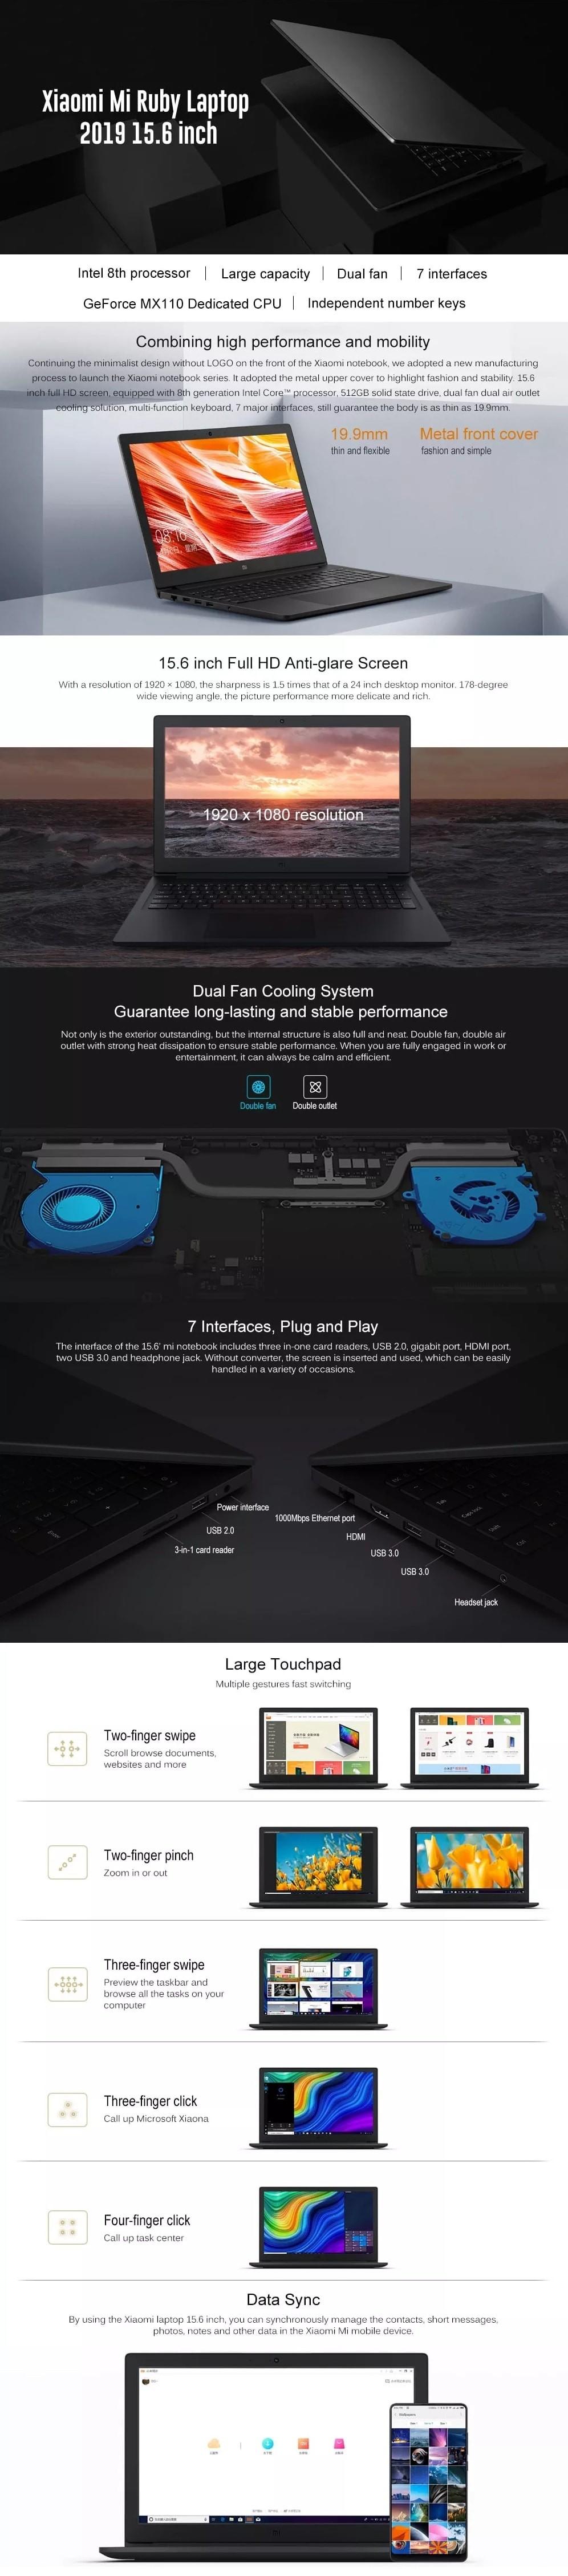 Prezentare-Xiaomi-Mi-Ruby-Air-i7-8-51292a65d4d3dfe18c2.jpg